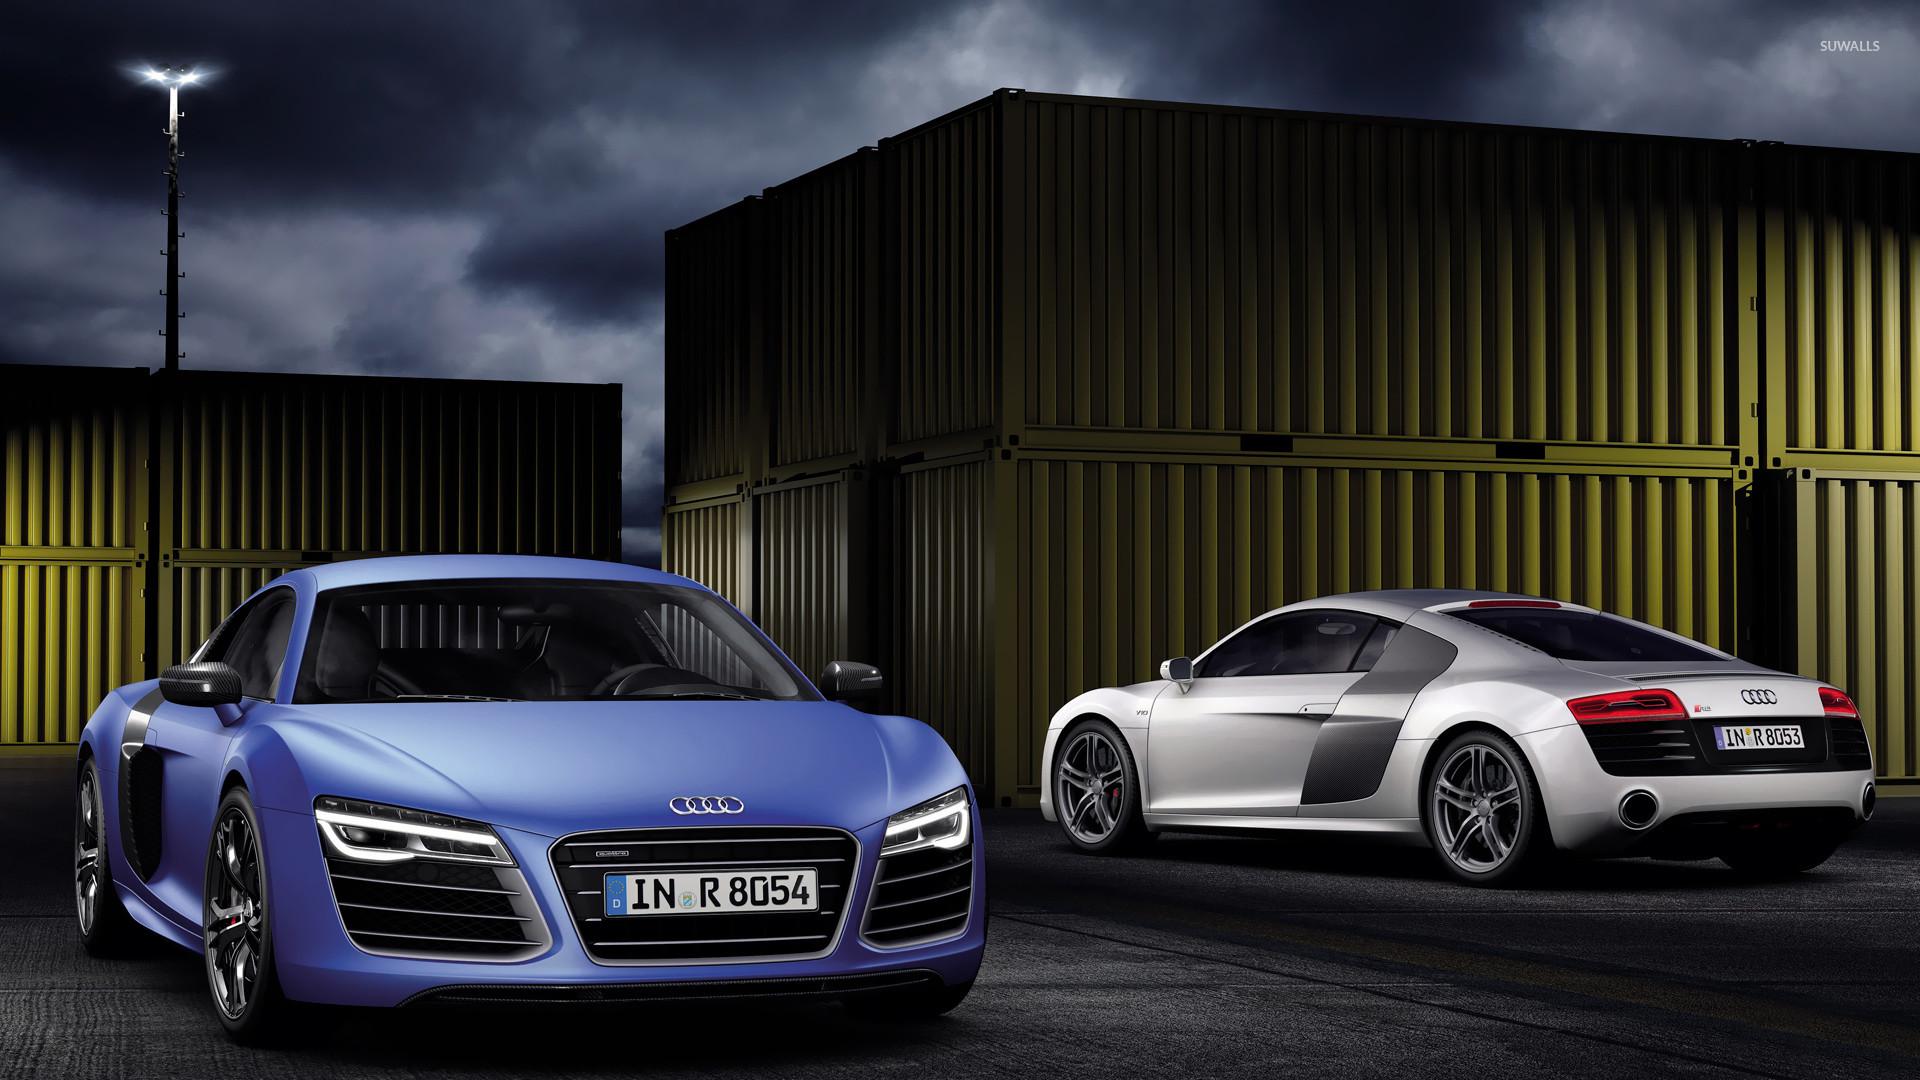 2013 white and blue Audi R8 V10 Plus wallpaper